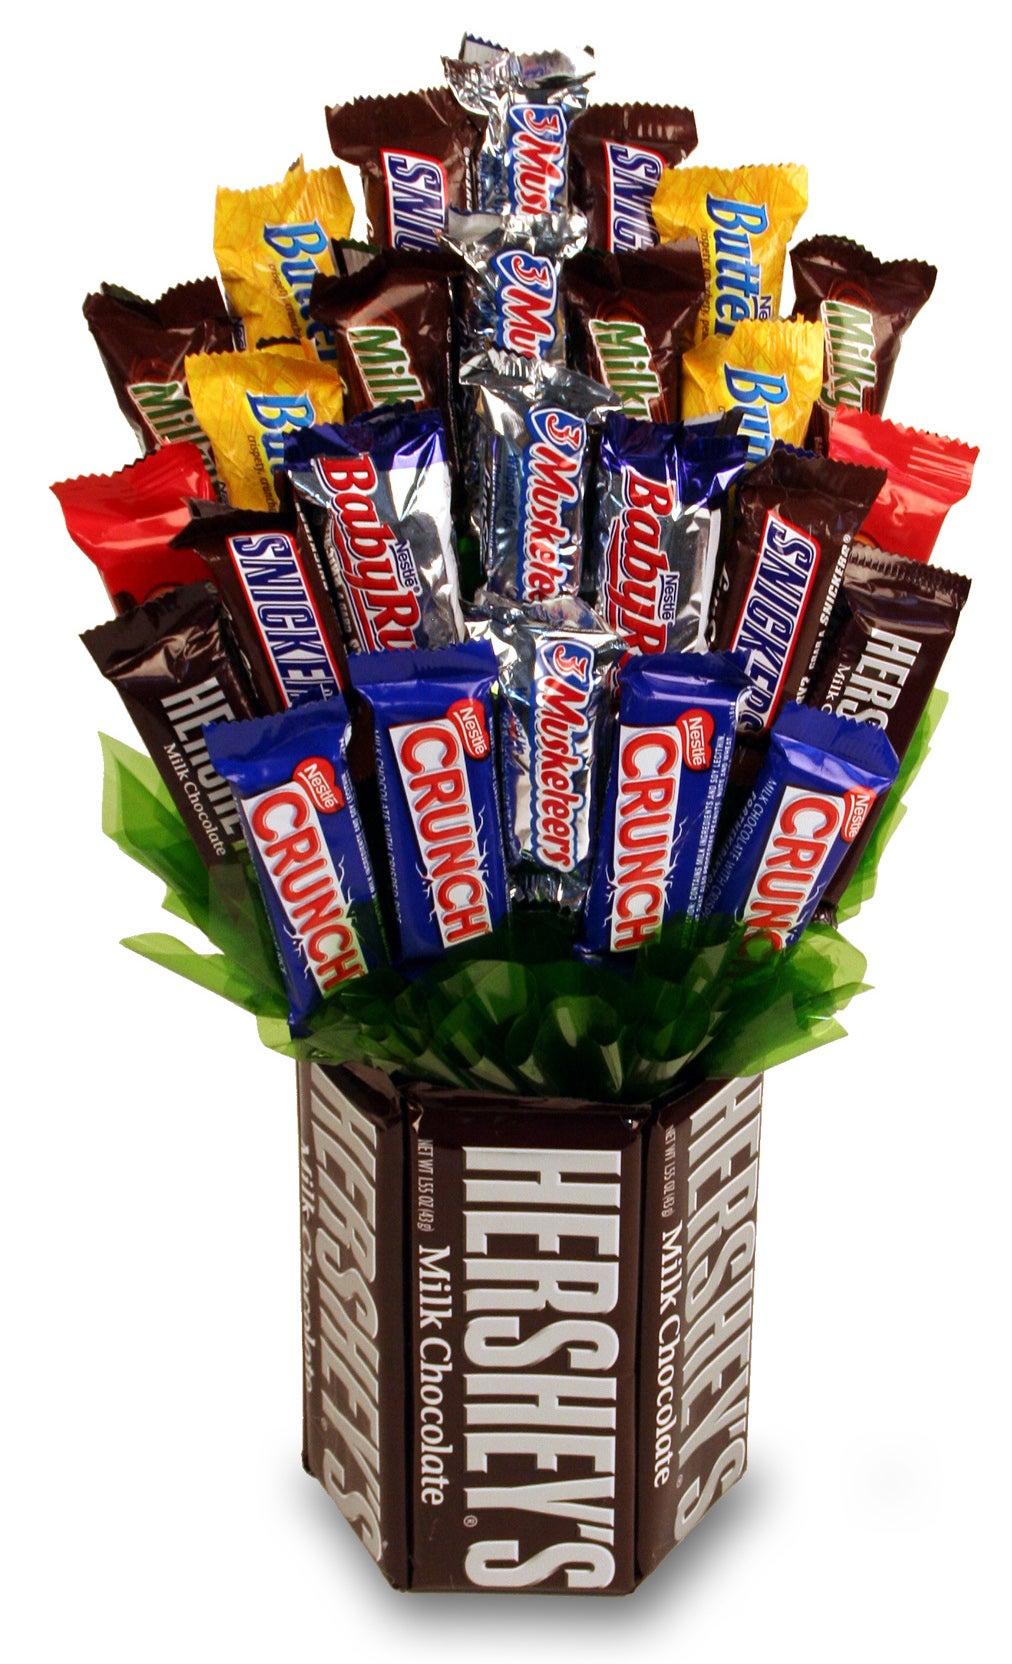 Sweets In Bloom Chocolate Indulgence